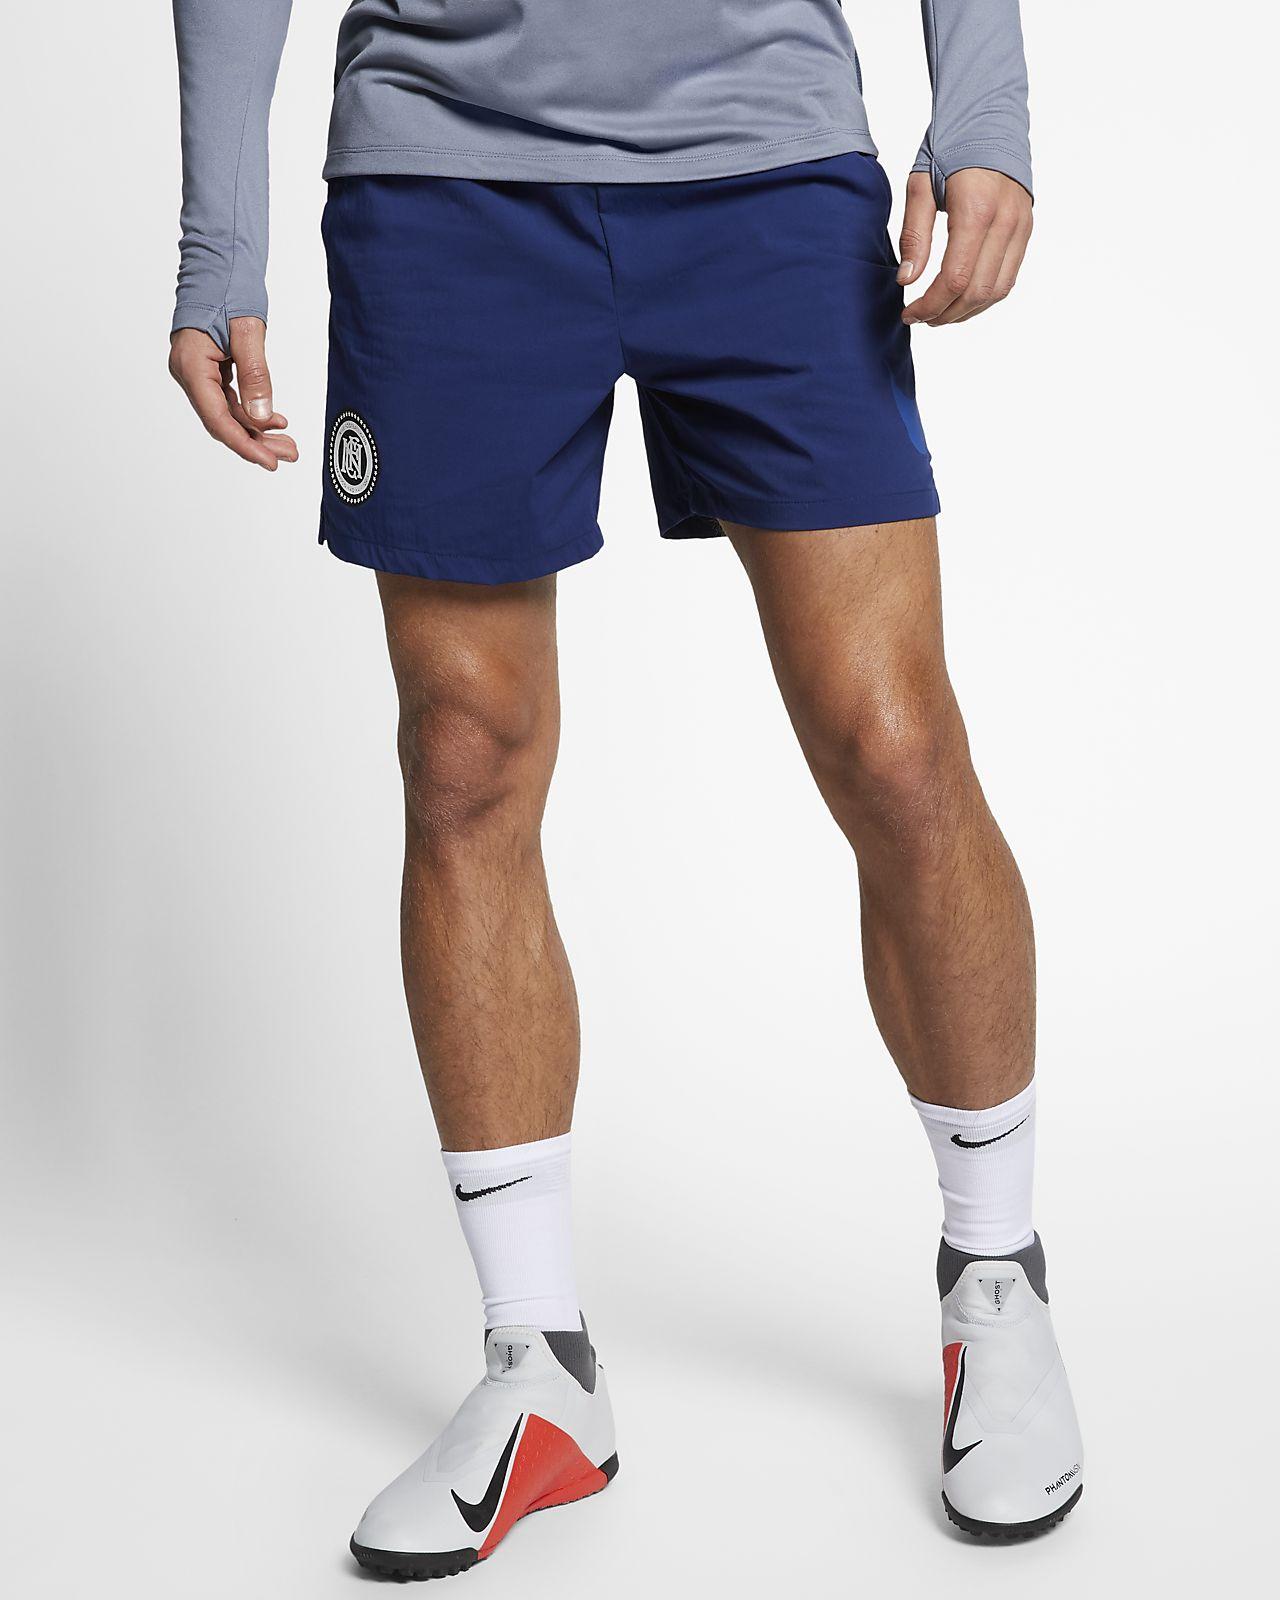 Shorts de fútbol para hombre Nike F.C.